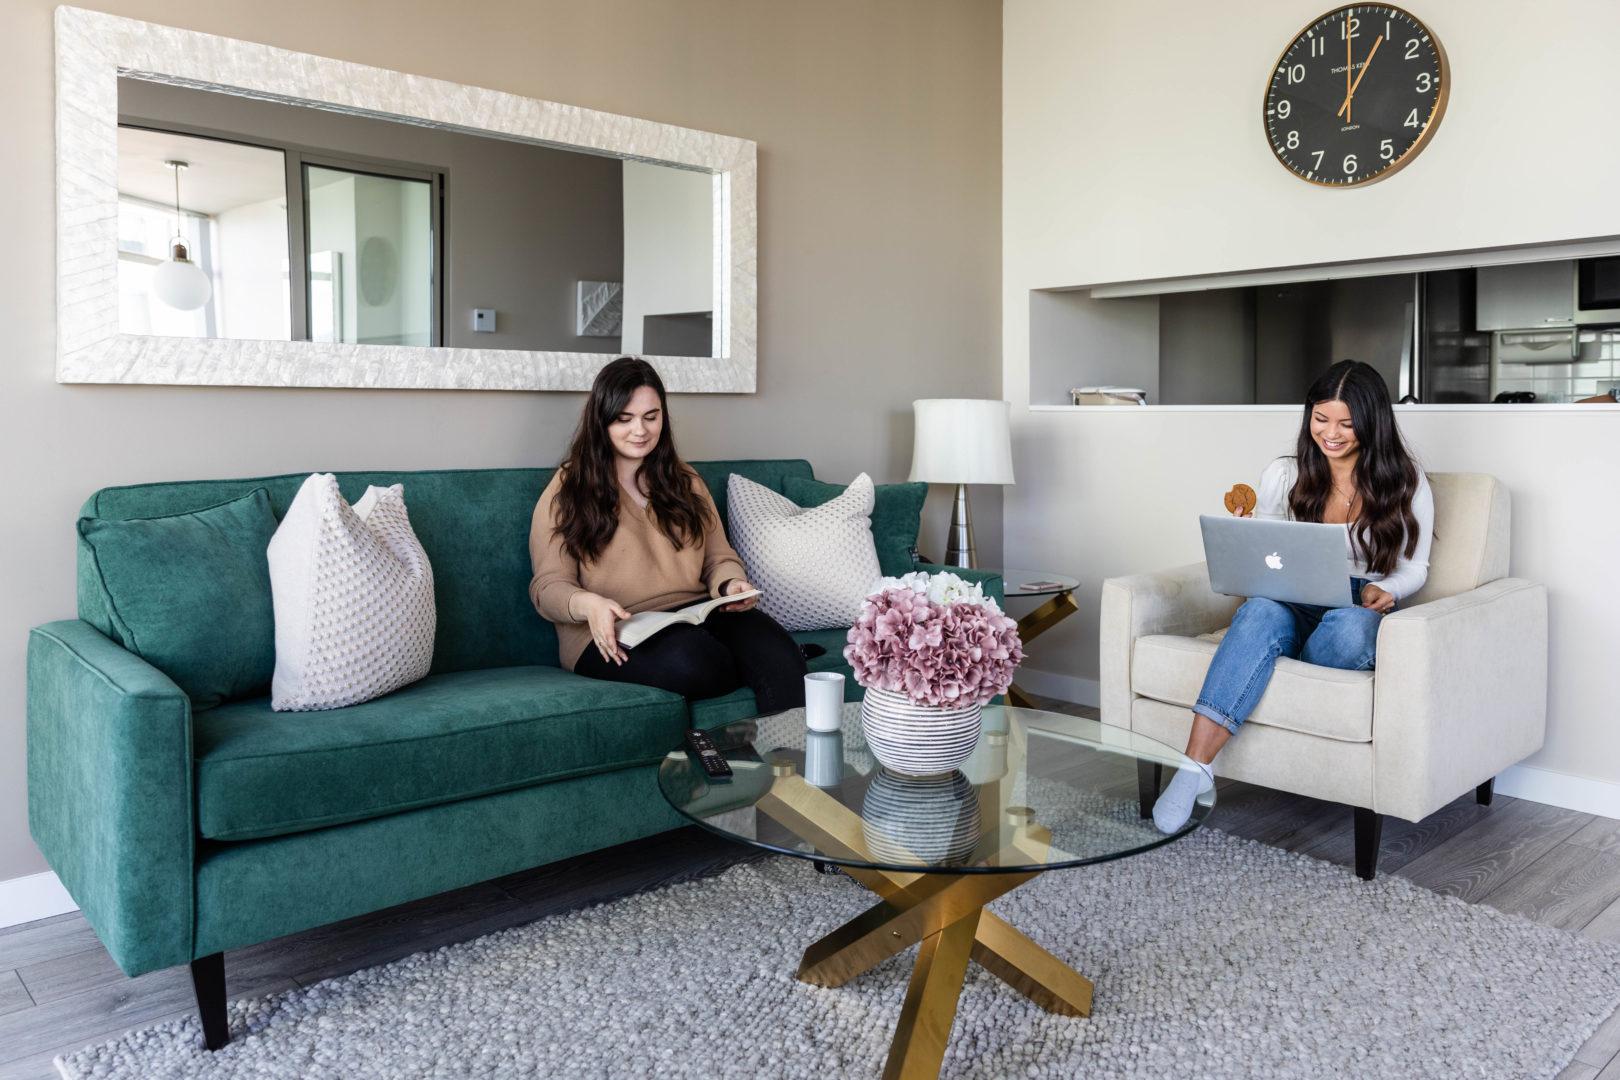 people-in-living-room